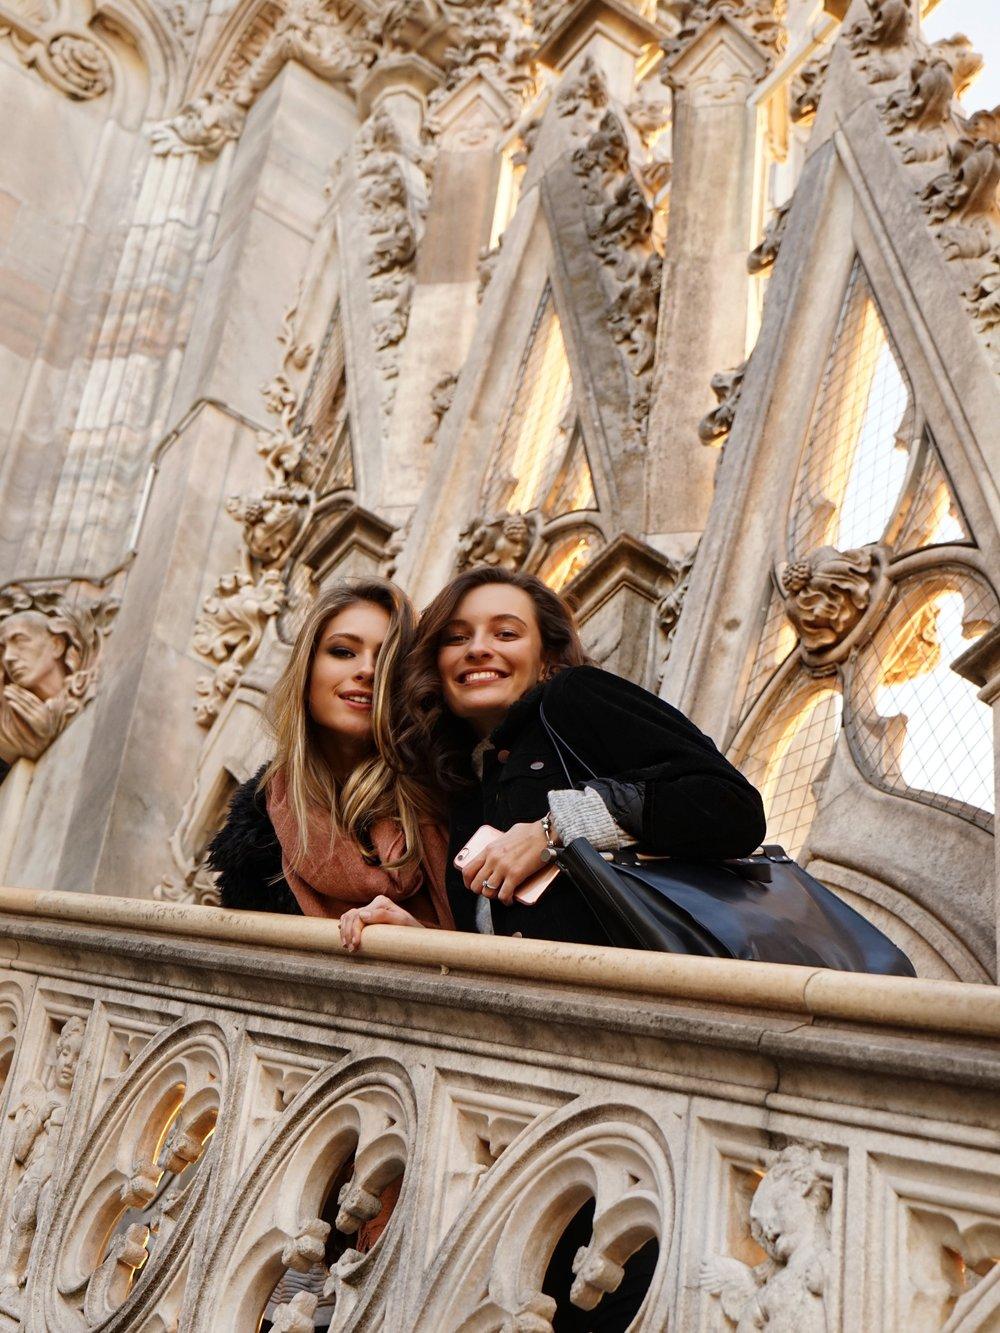 On Top Of Duomo next to the Clouds Model David topmodel lundin-04.jpg